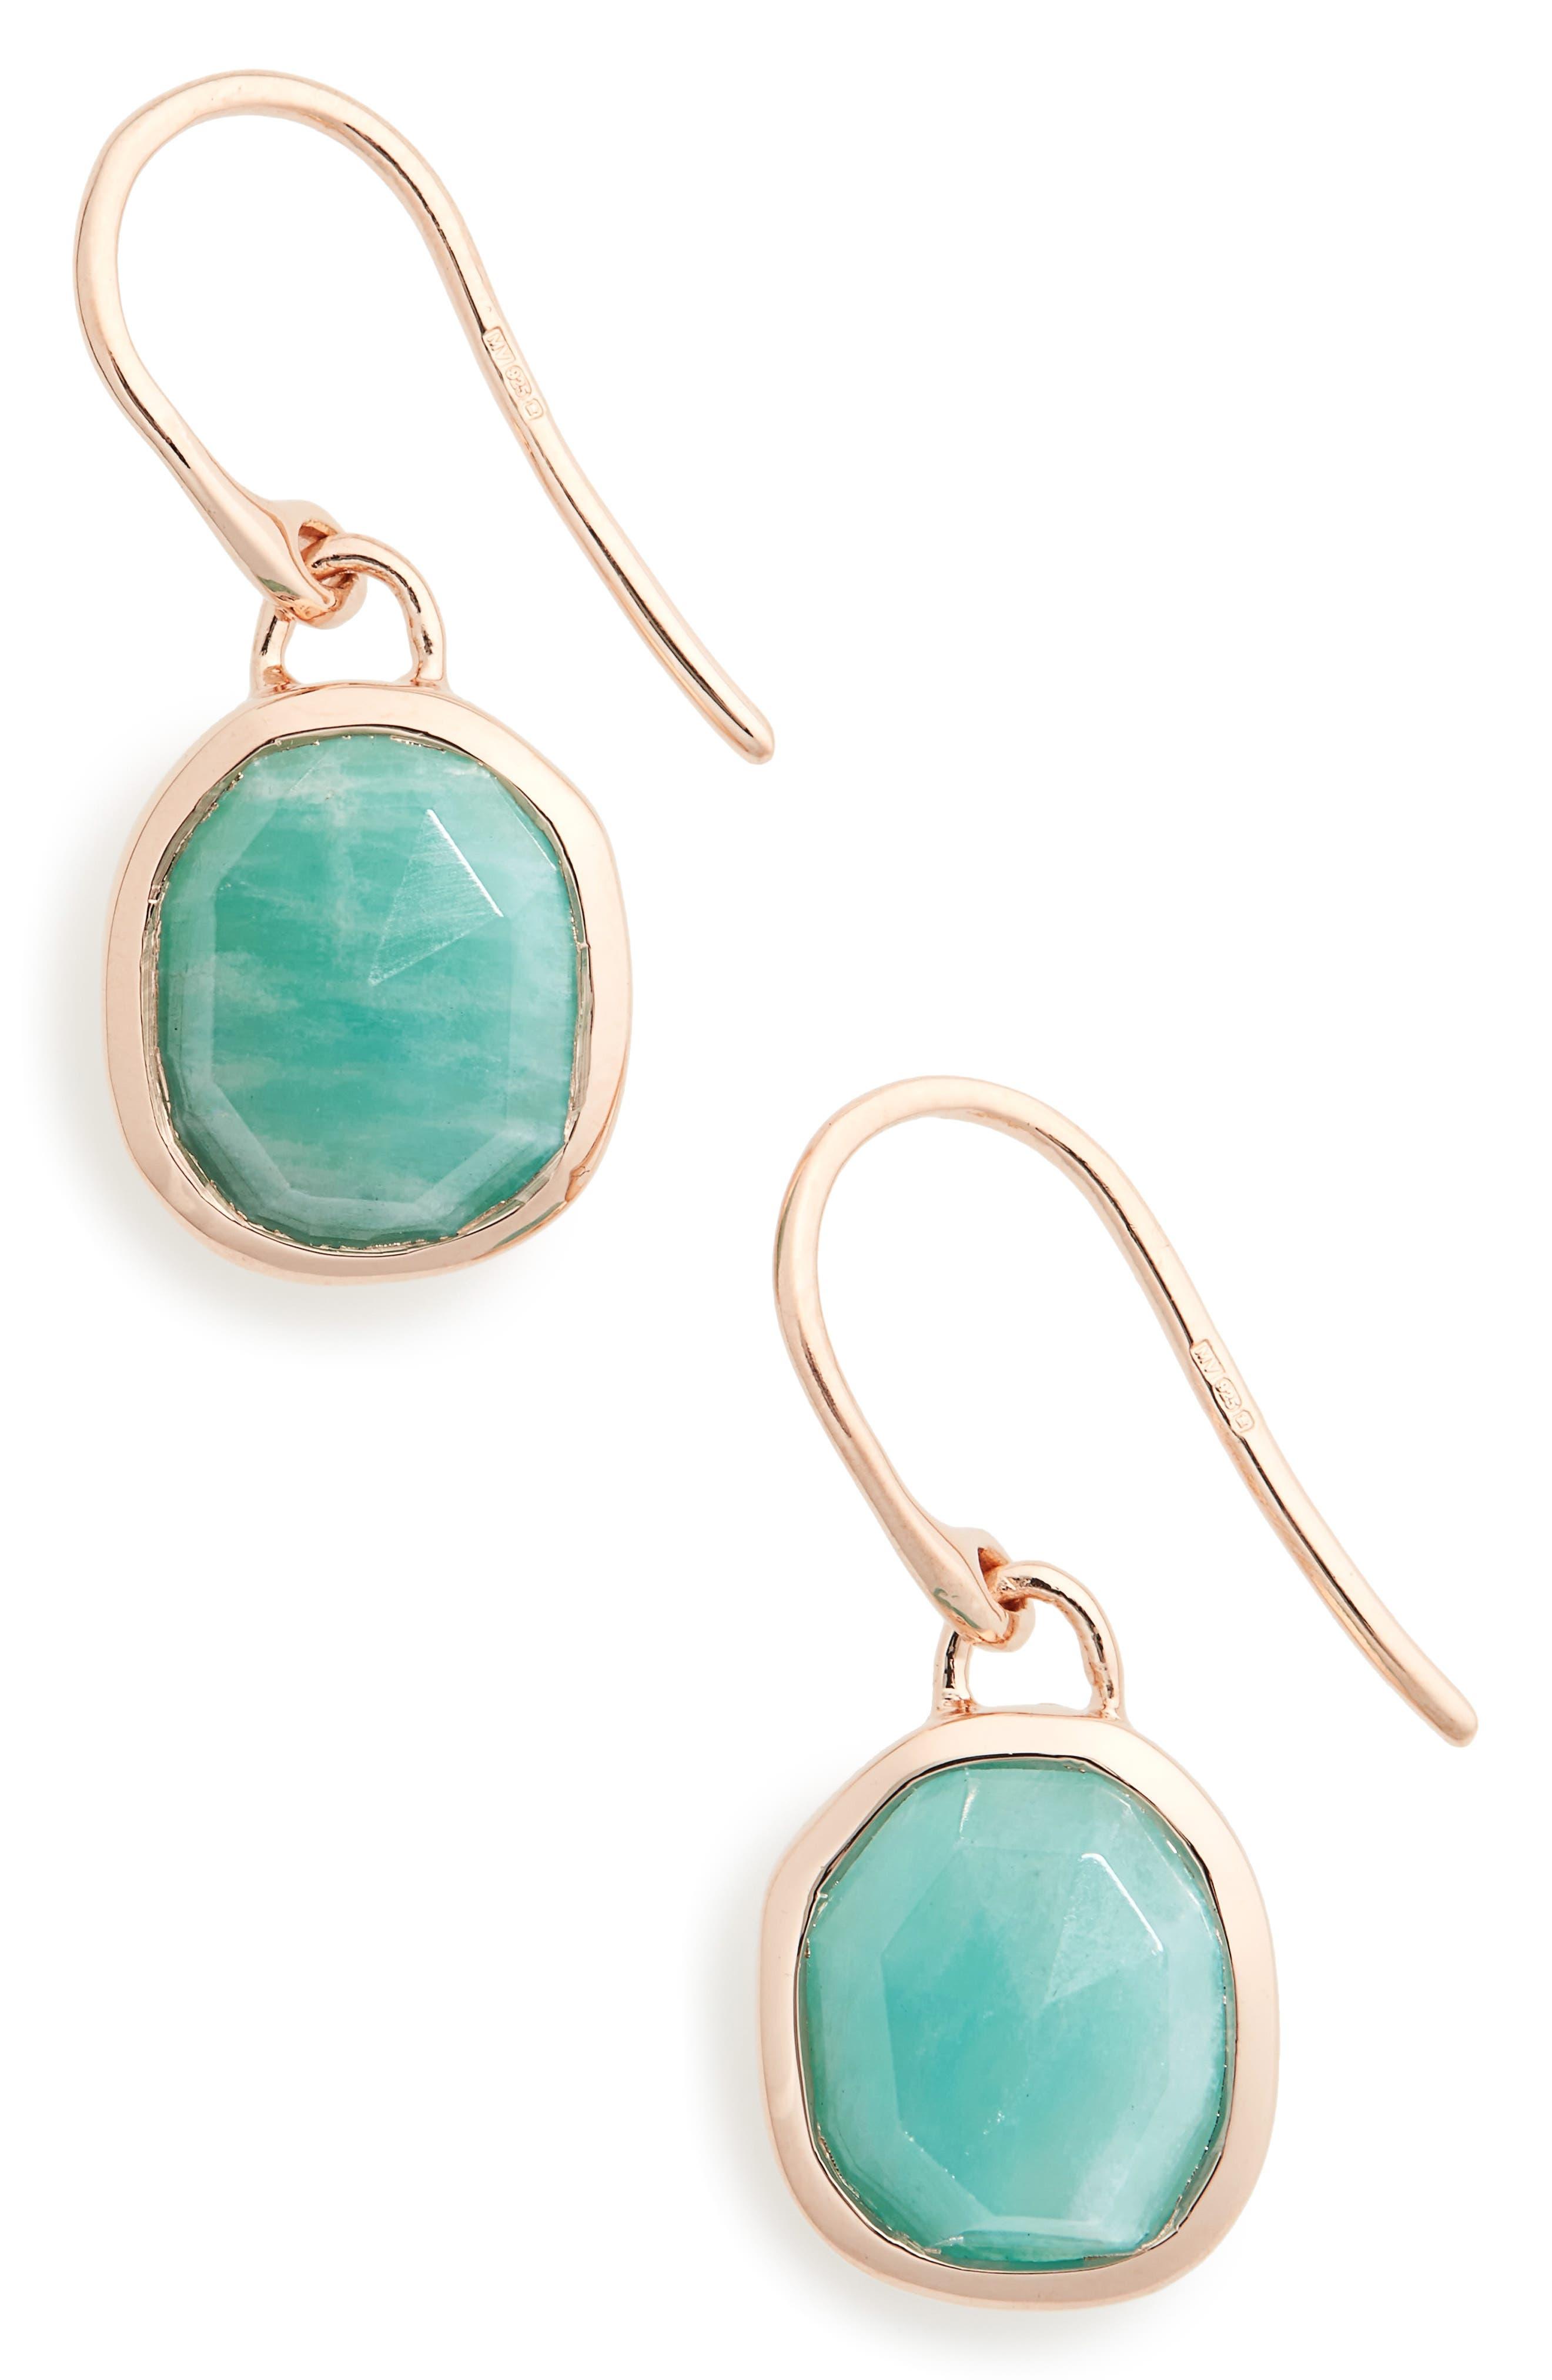 Siren Semiprecious Stone Drop Earrings,                         Main,                         color, AMAZONITE/ ROSE GOLD